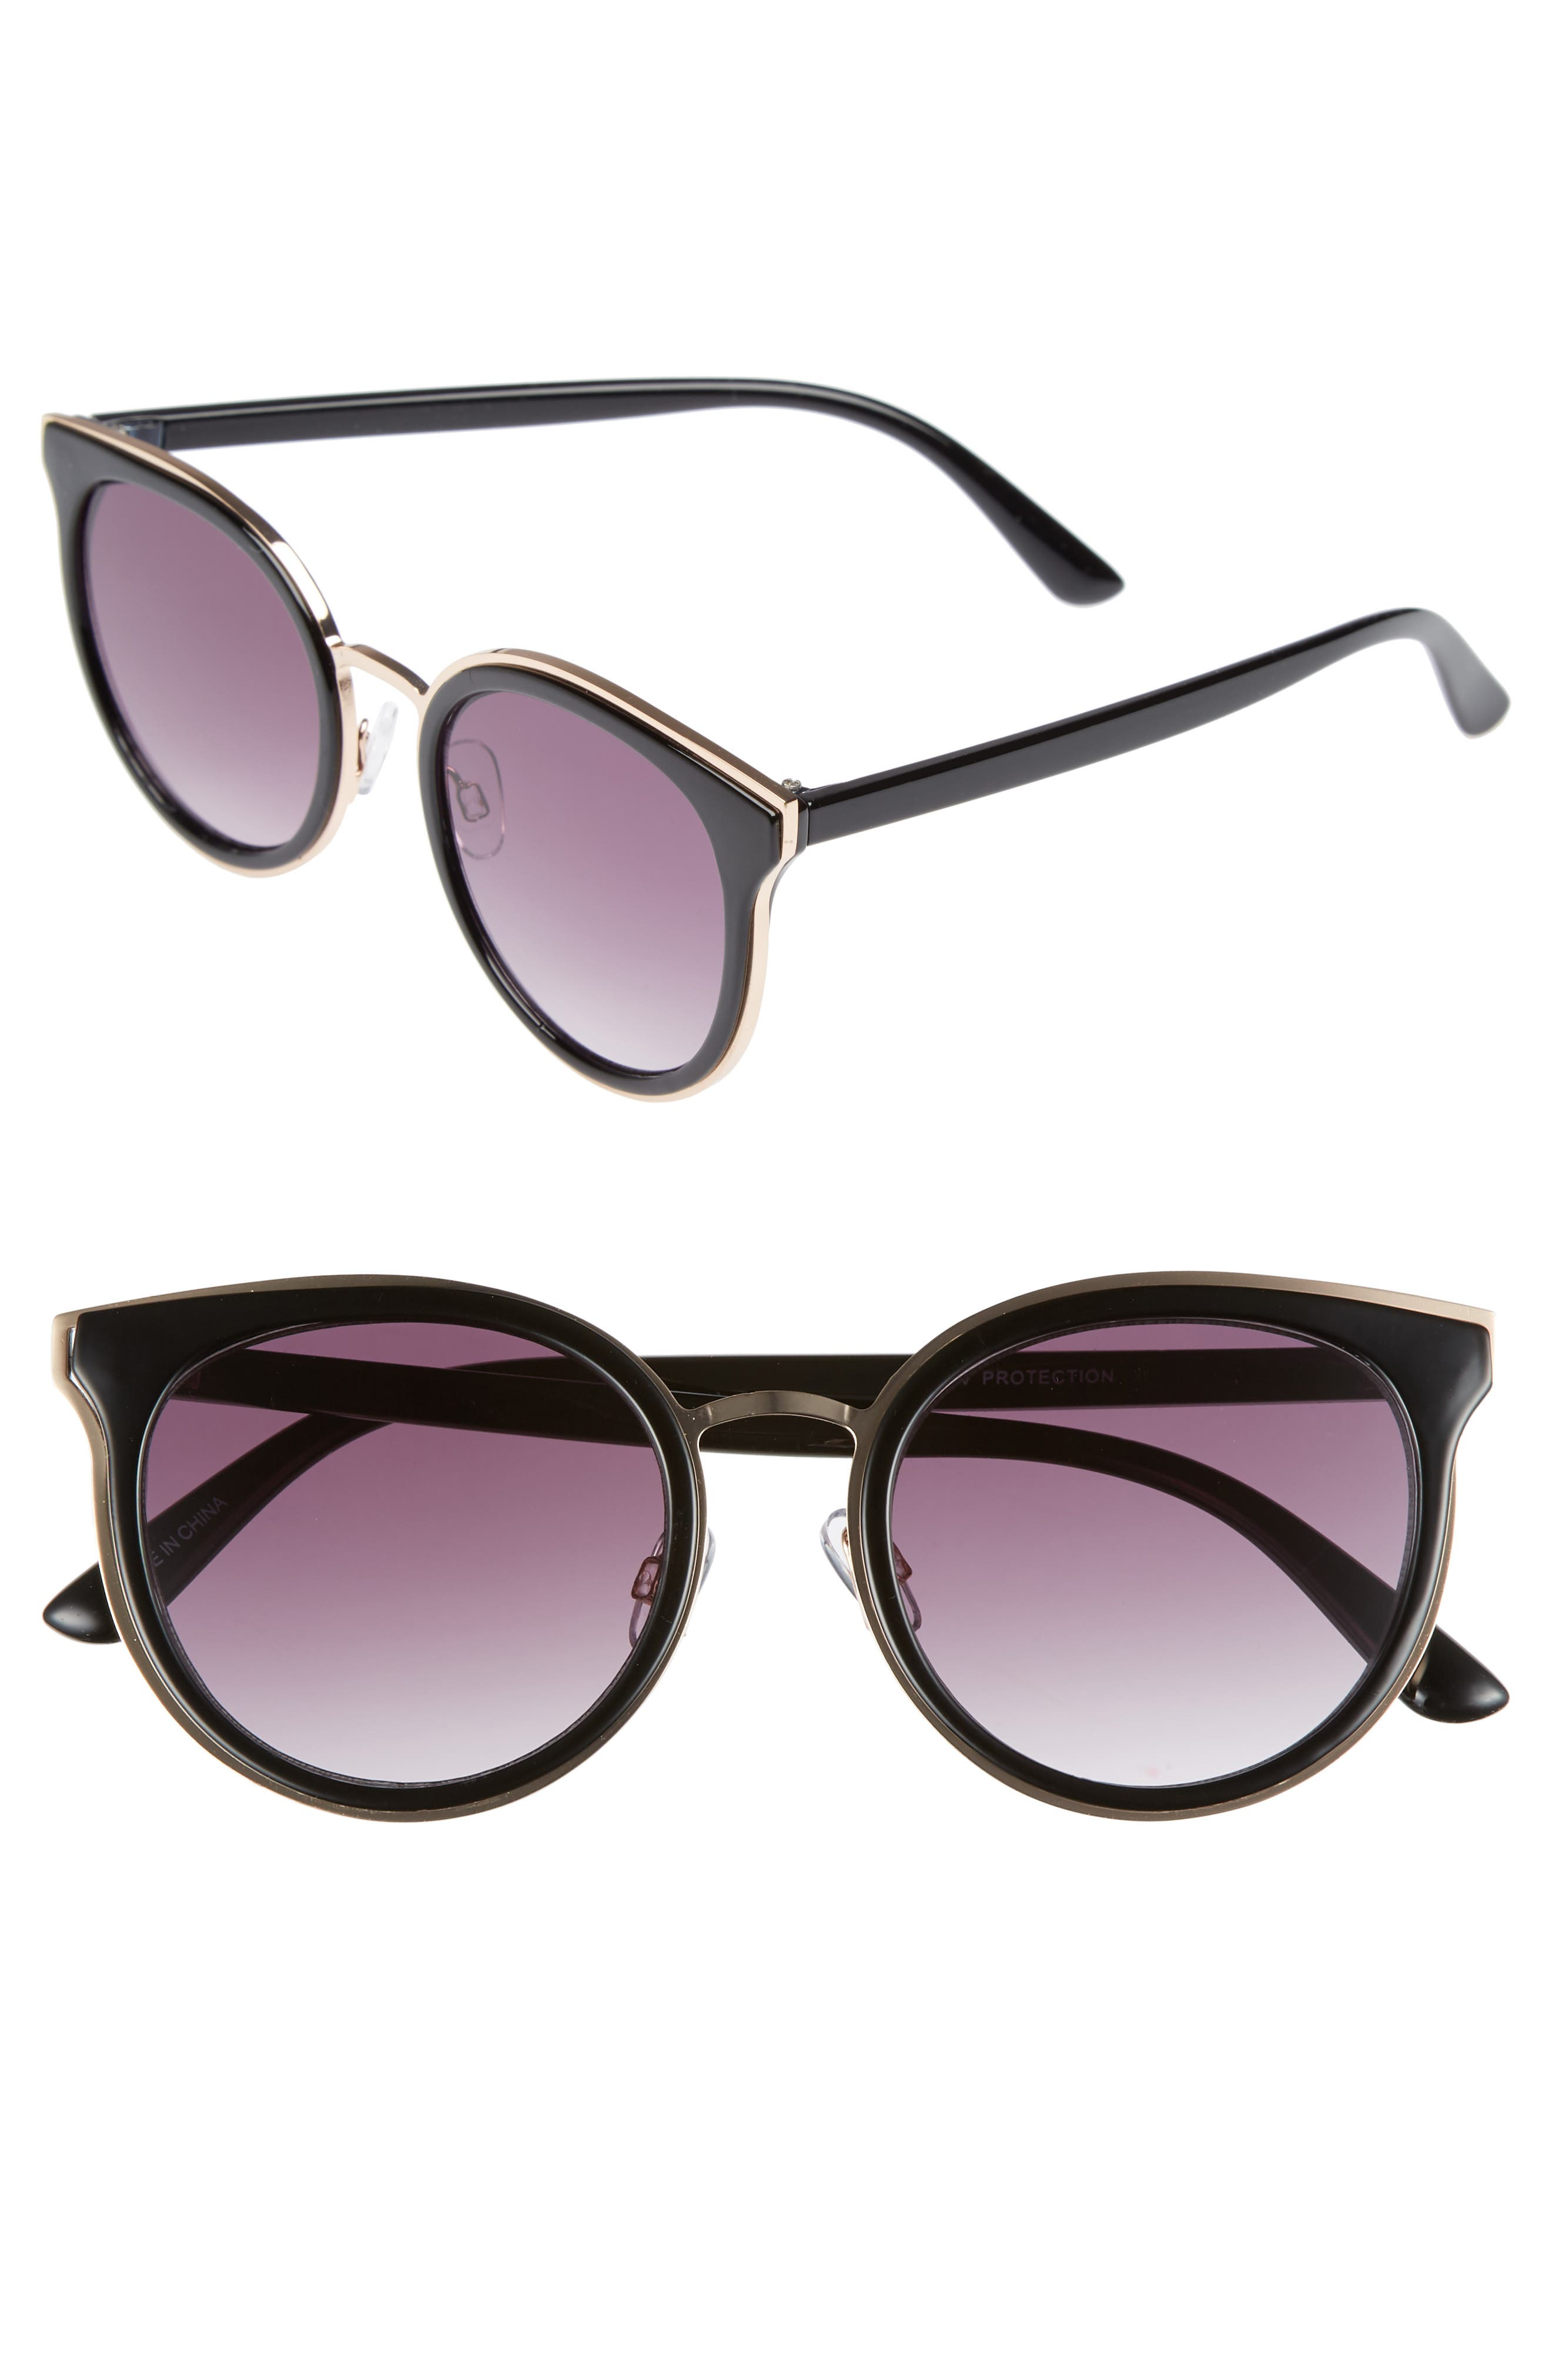 59mm Round Sunglasses,                         Main,                         color, Gold/ Black